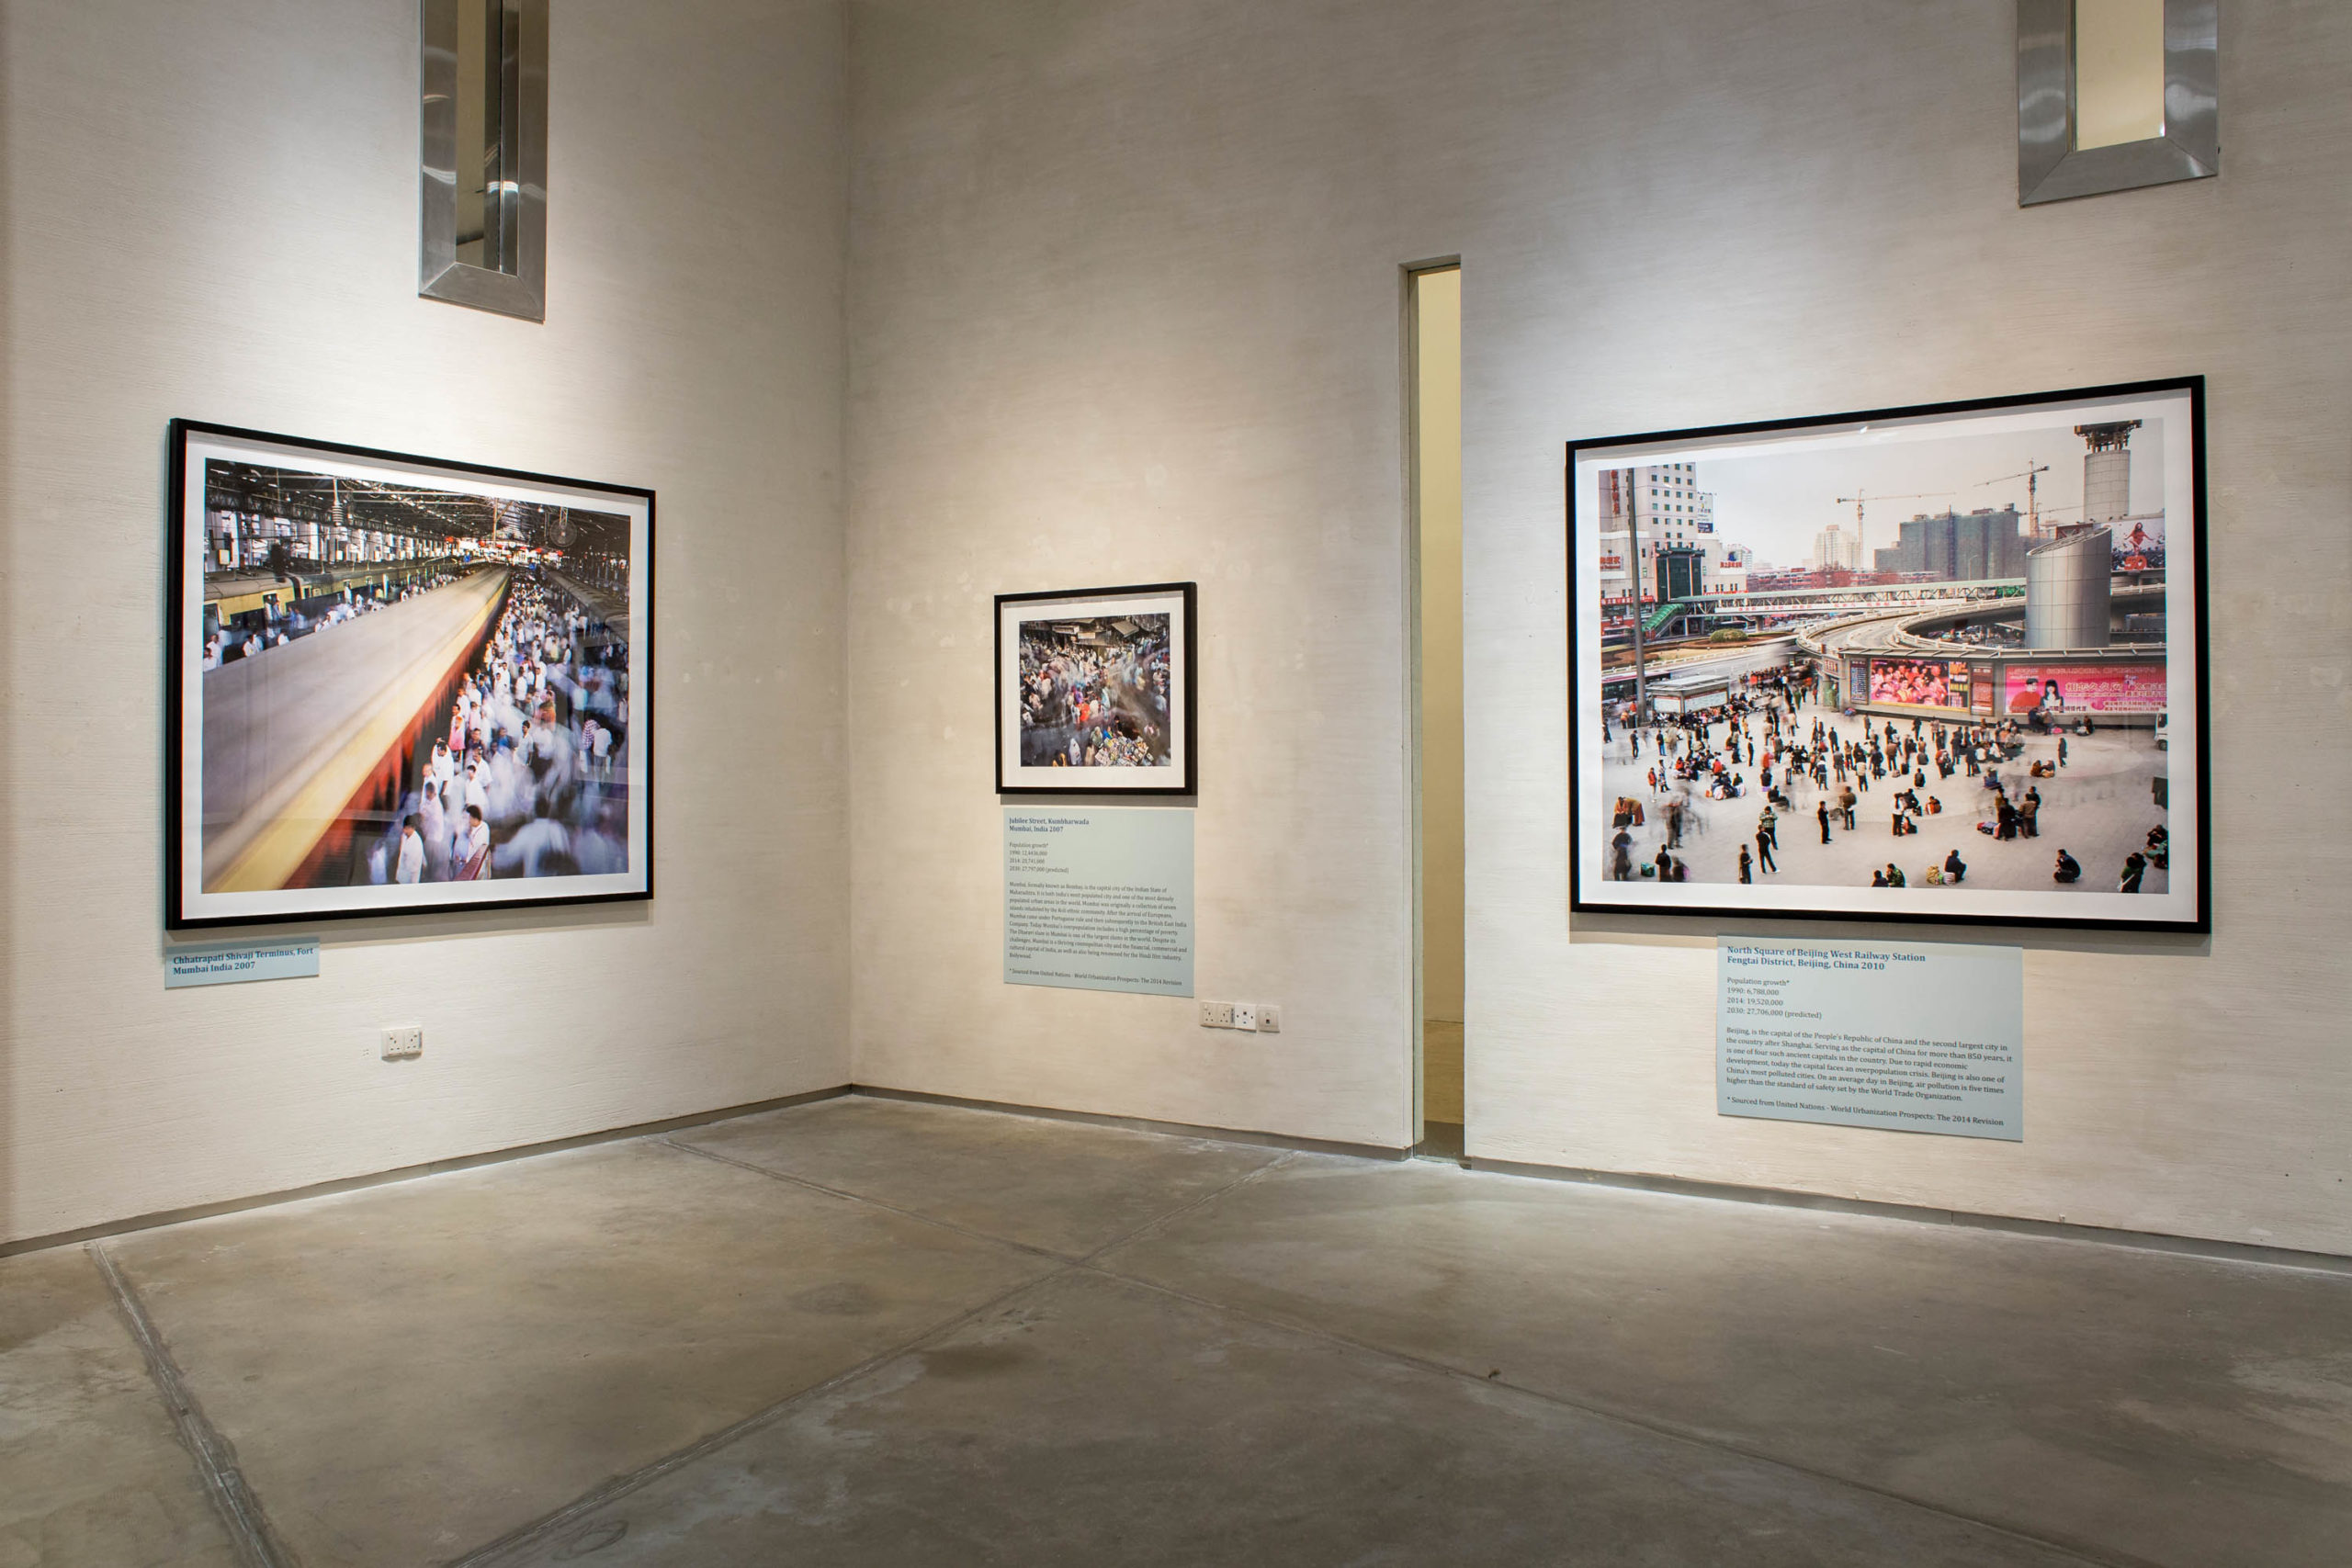 East Wing Gallery, Dubai